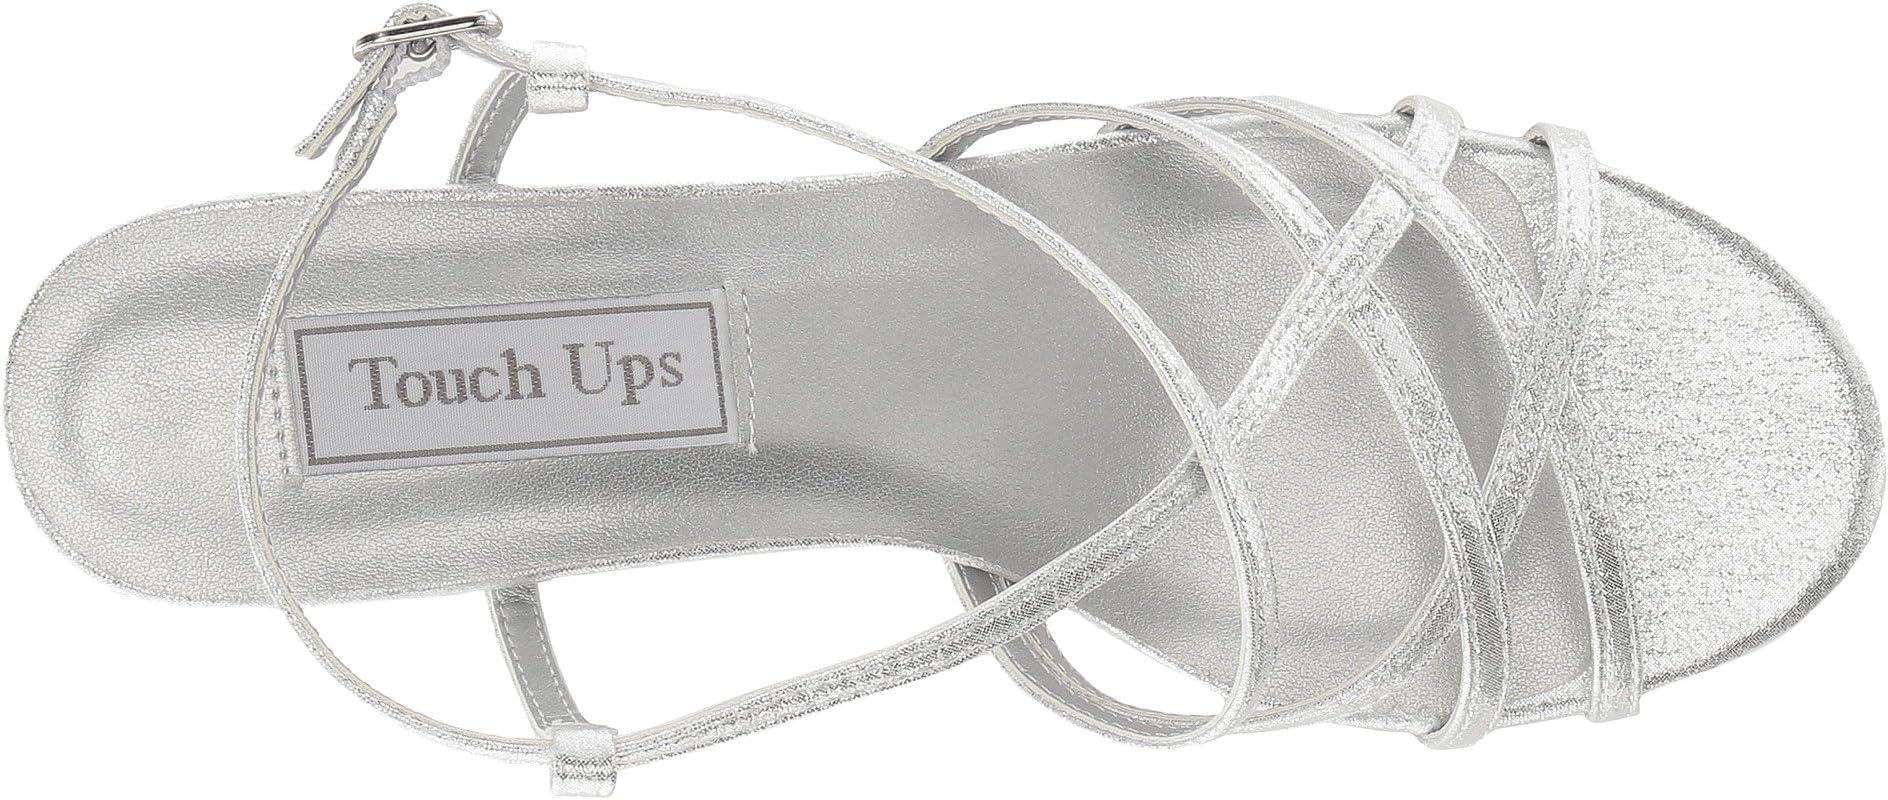 Touch Ups Eva   Women's shoes   2020 Newest